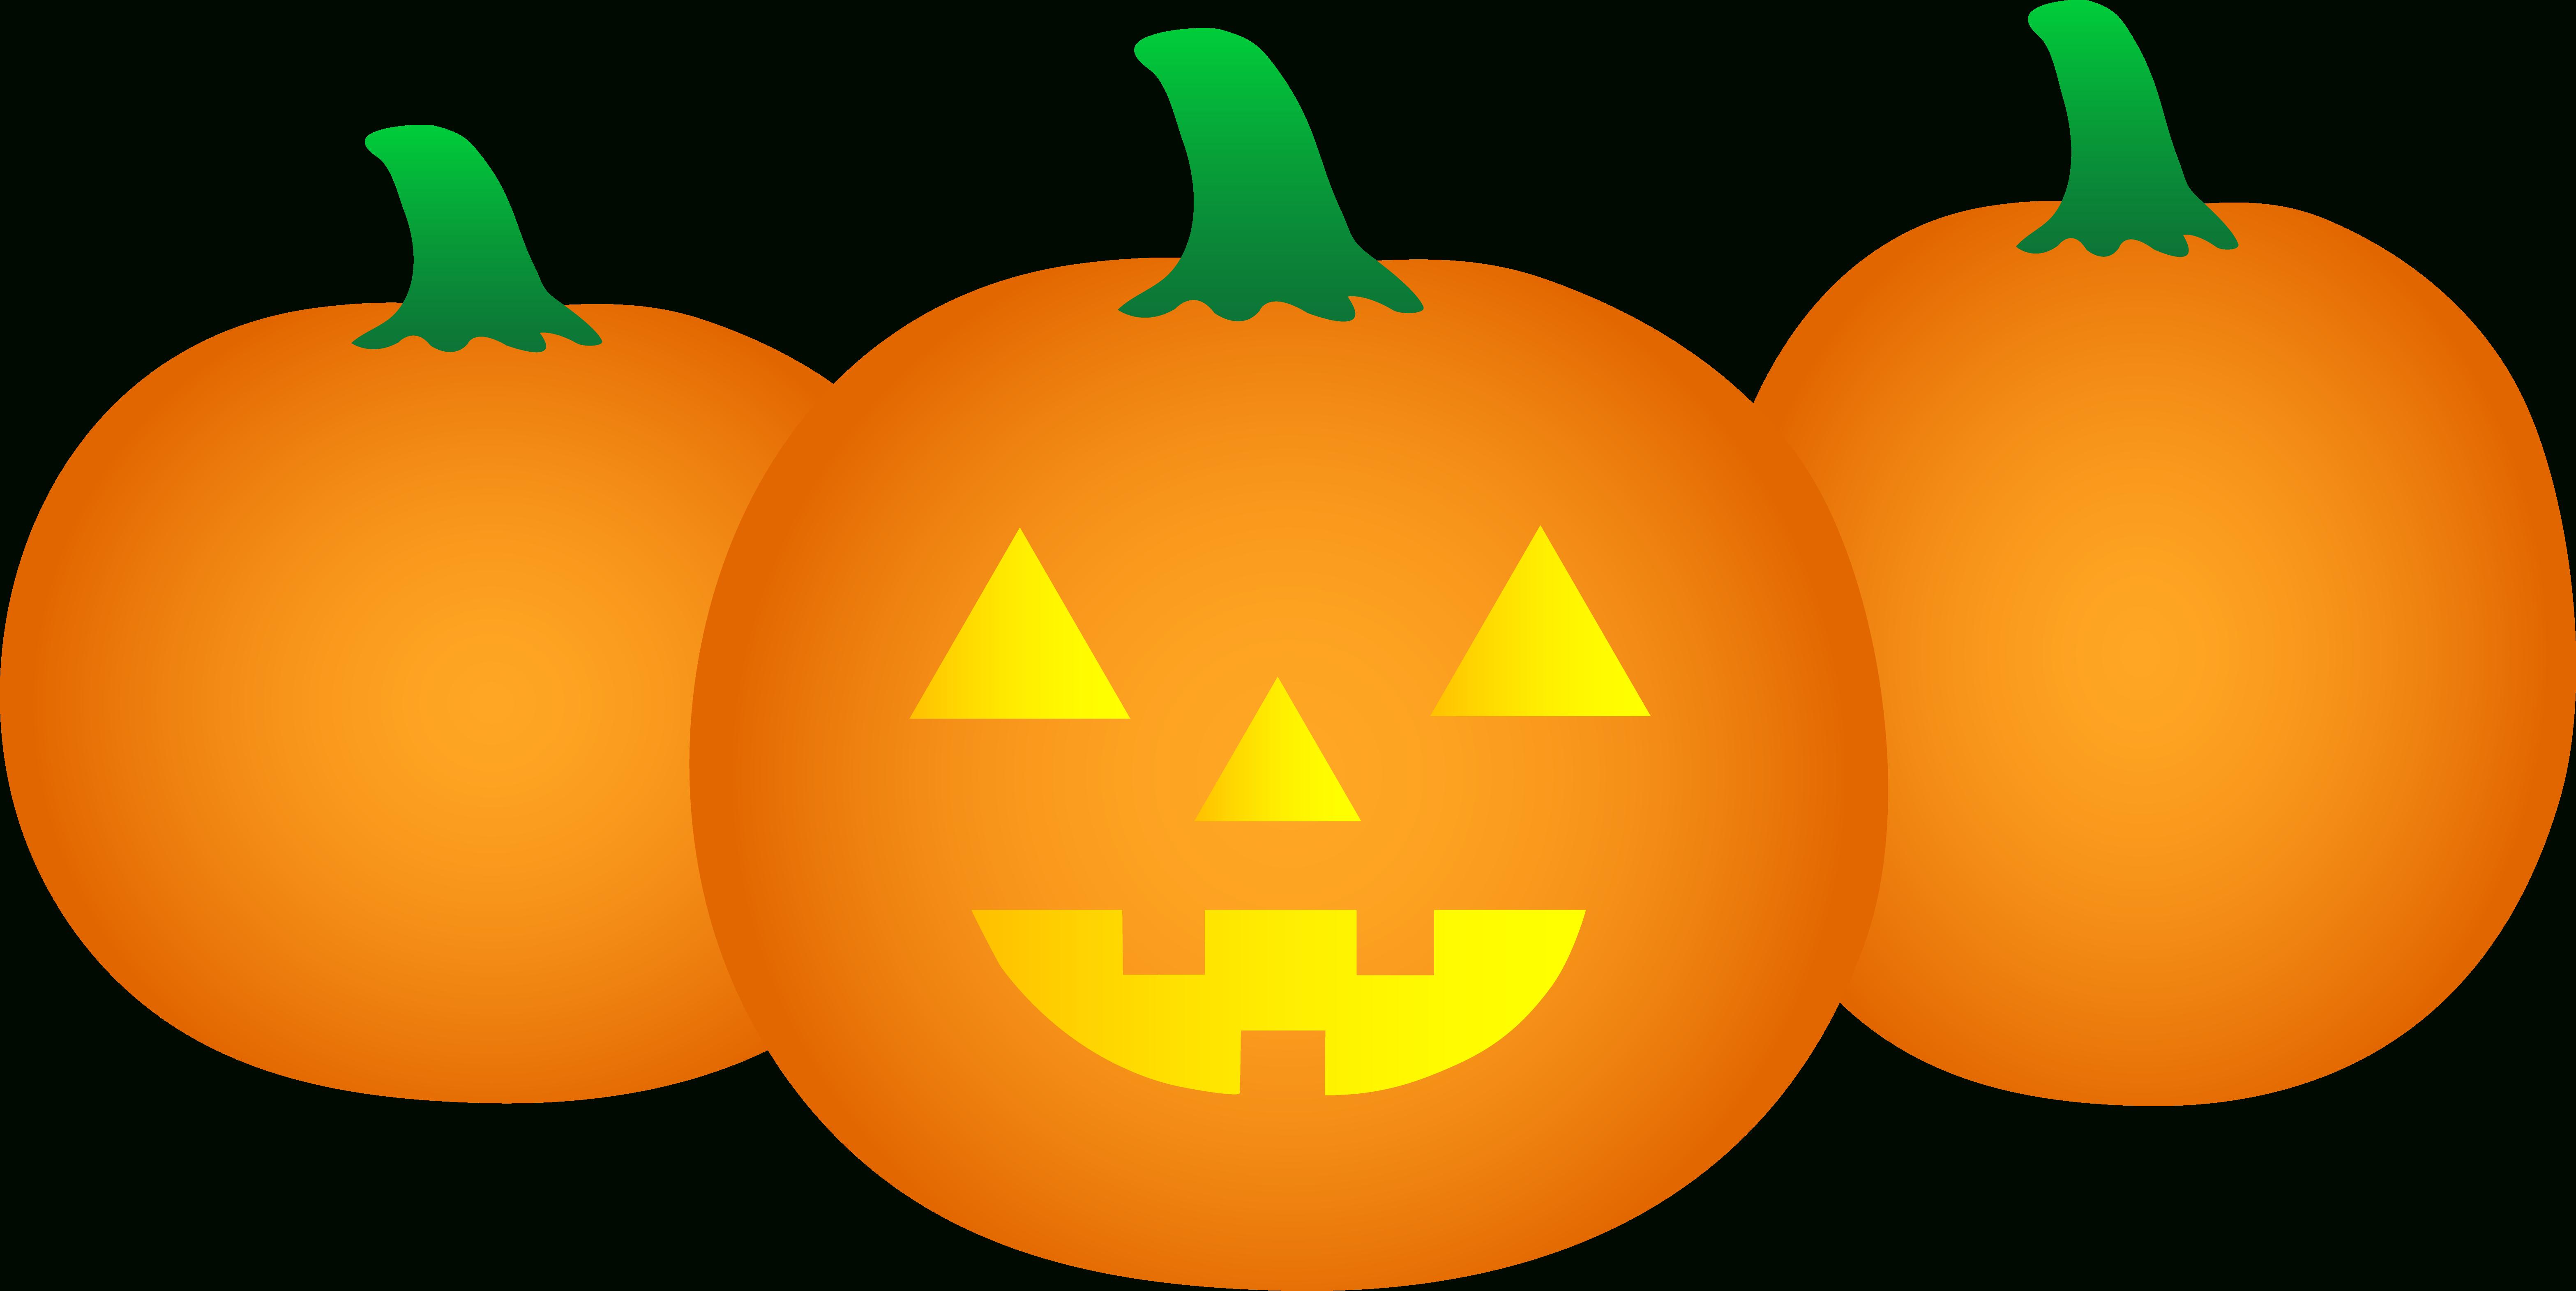 Free Pictures Of Halloween Pumkins, Download Free Clip Art, Free - Free Halloween Pumpkin Printables